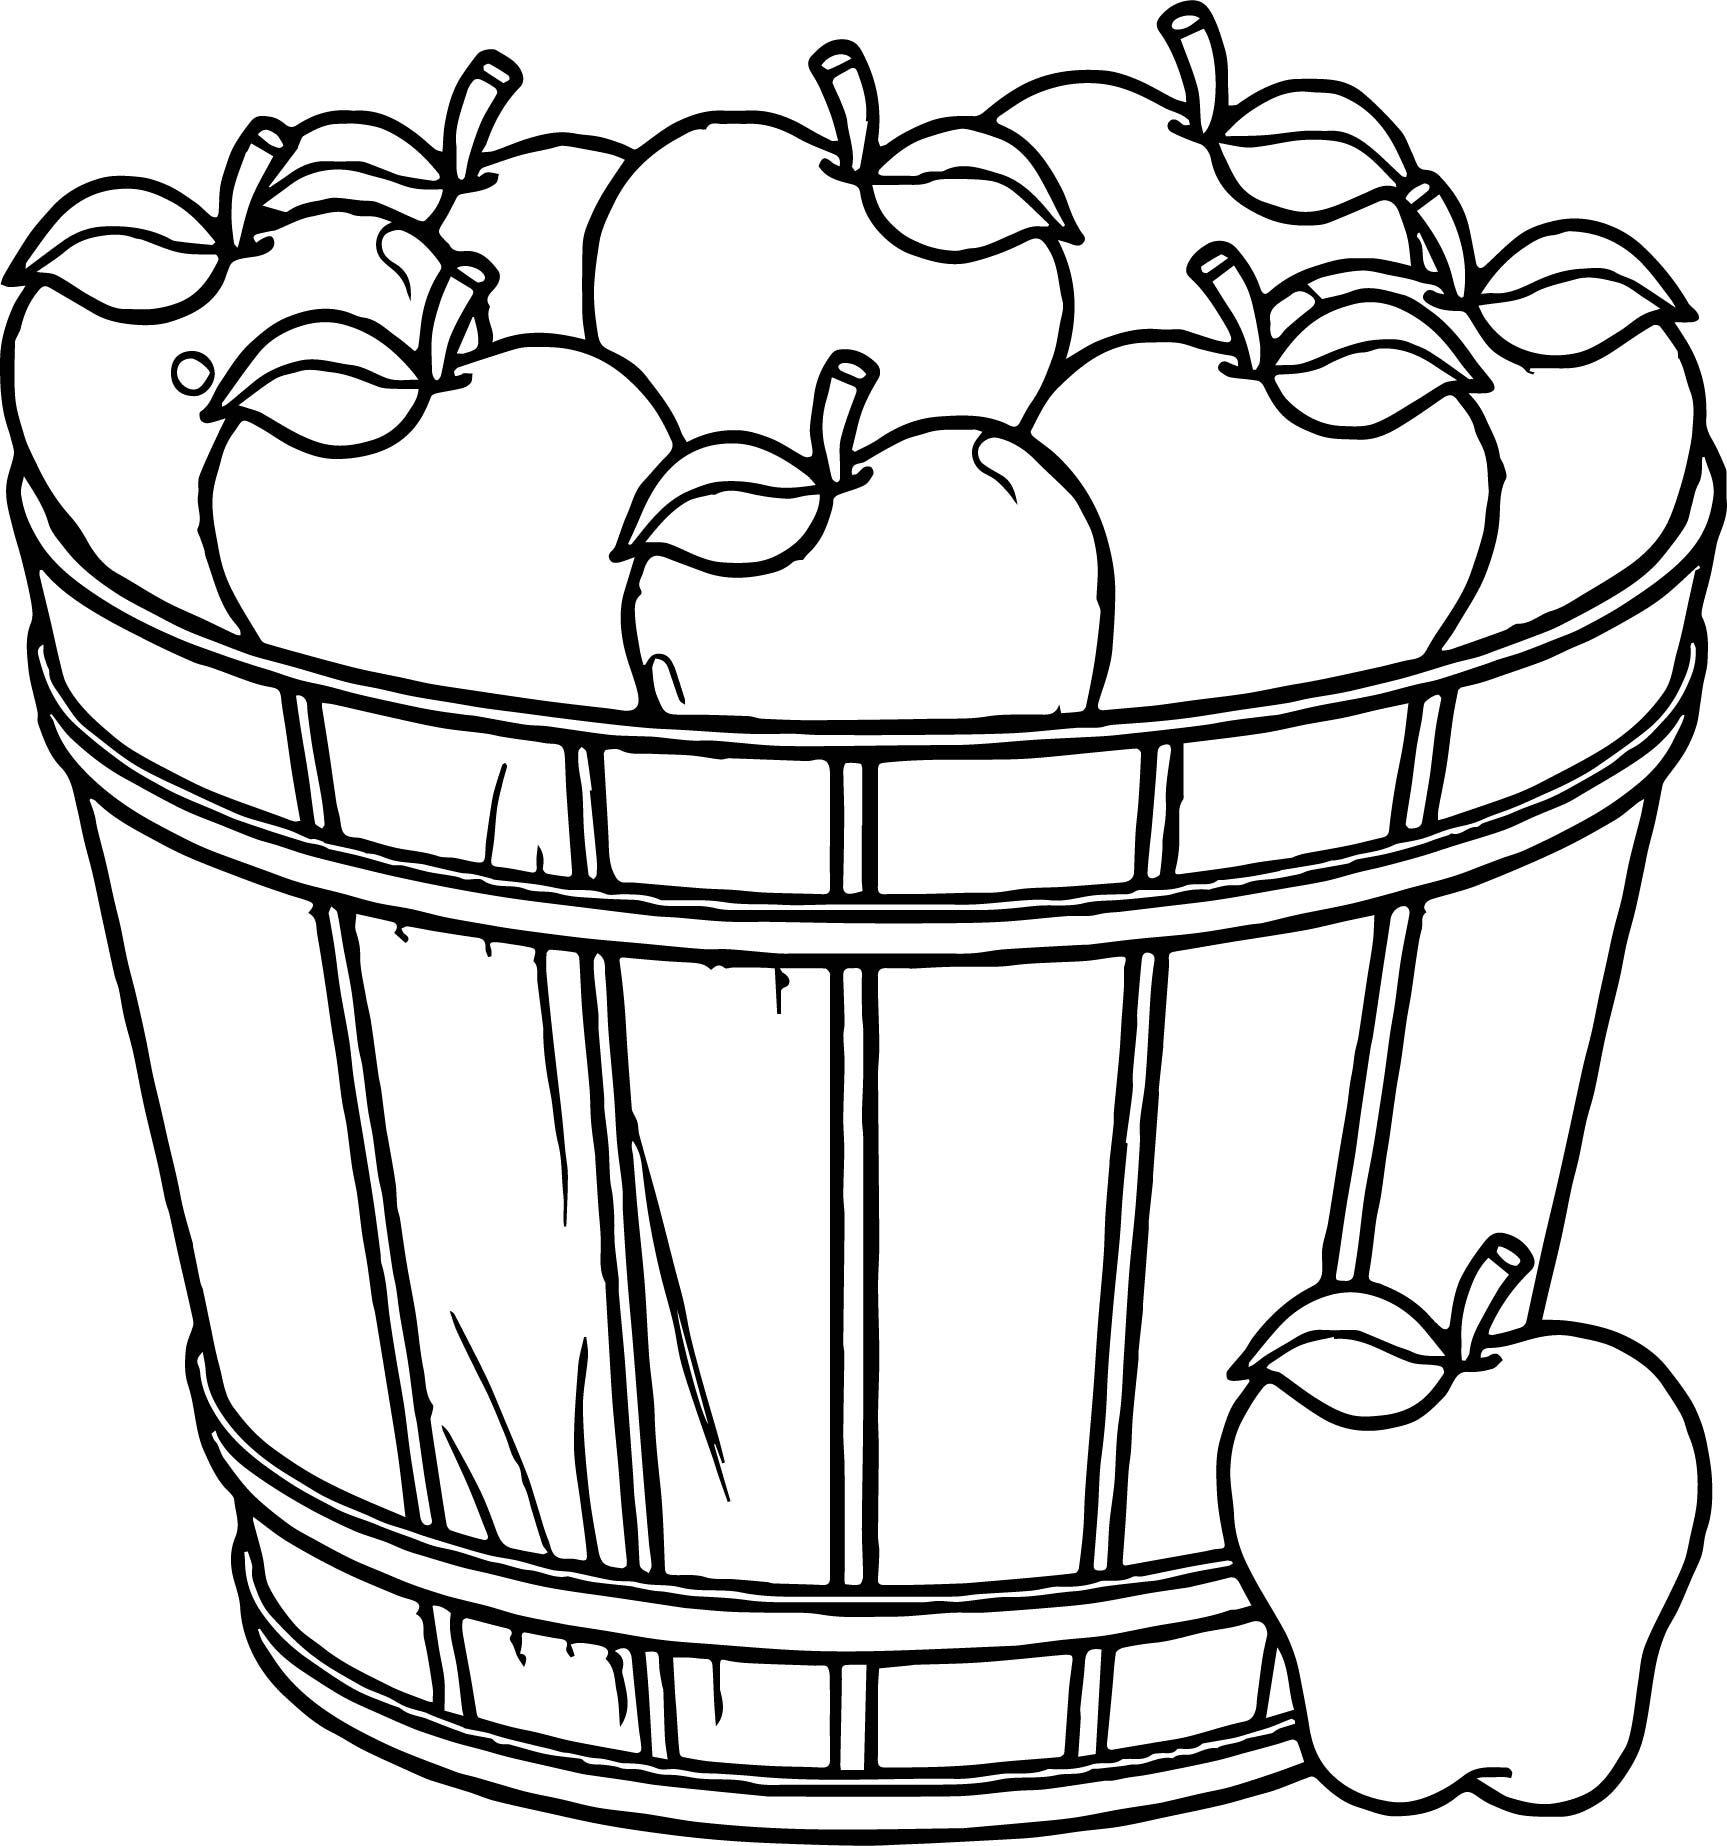 Apple basket clipart coloring page svg transparent library cool Apple Basket Coloring Page | wecoloringpage | Fruit coloring ... svg transparent library